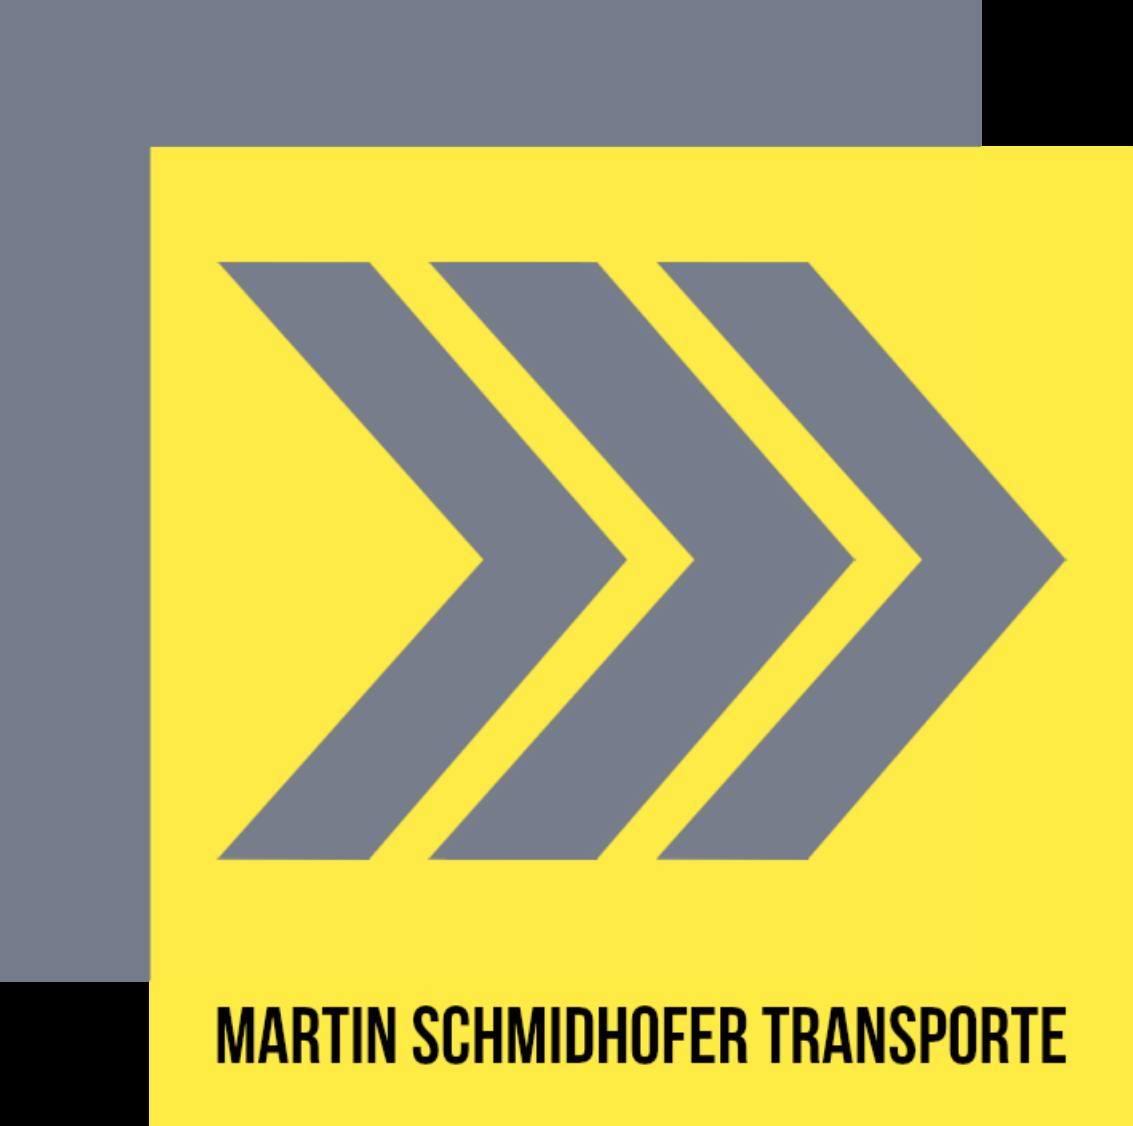 Martin Schmidhofer Transporte